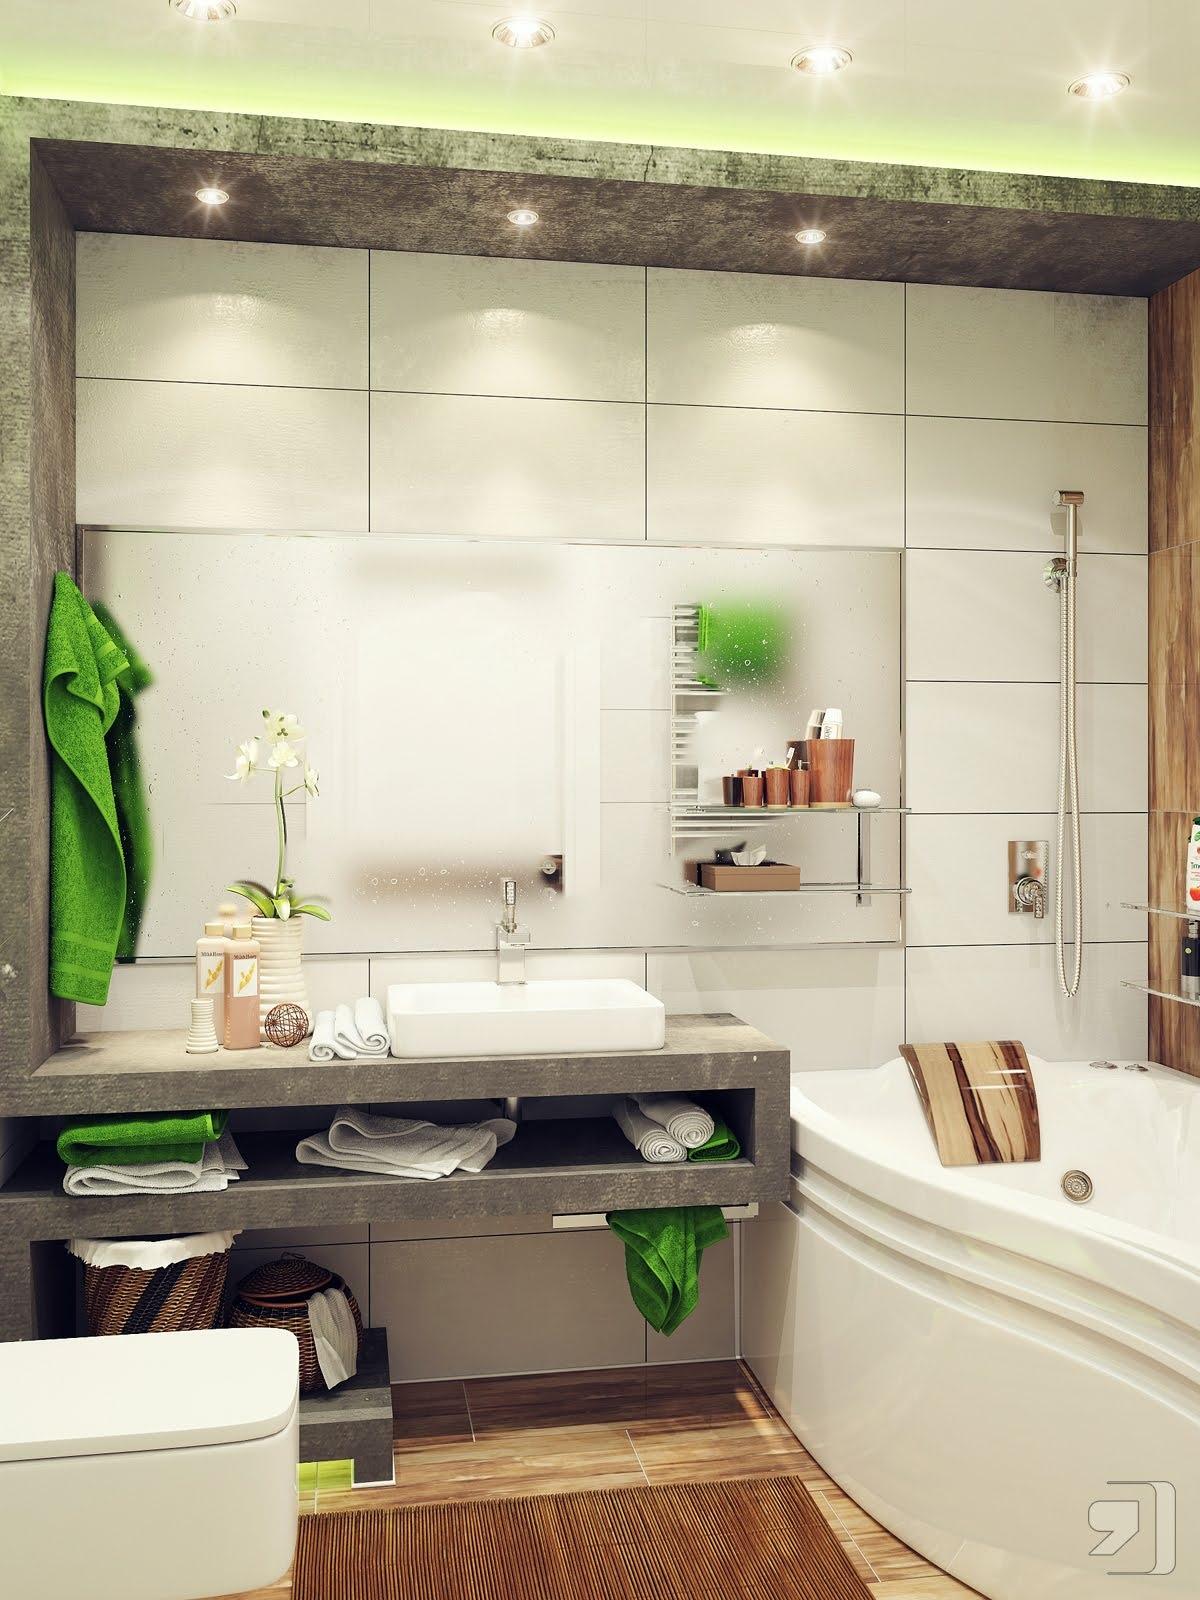 Bathroom Ideas: Small Bathroom Design